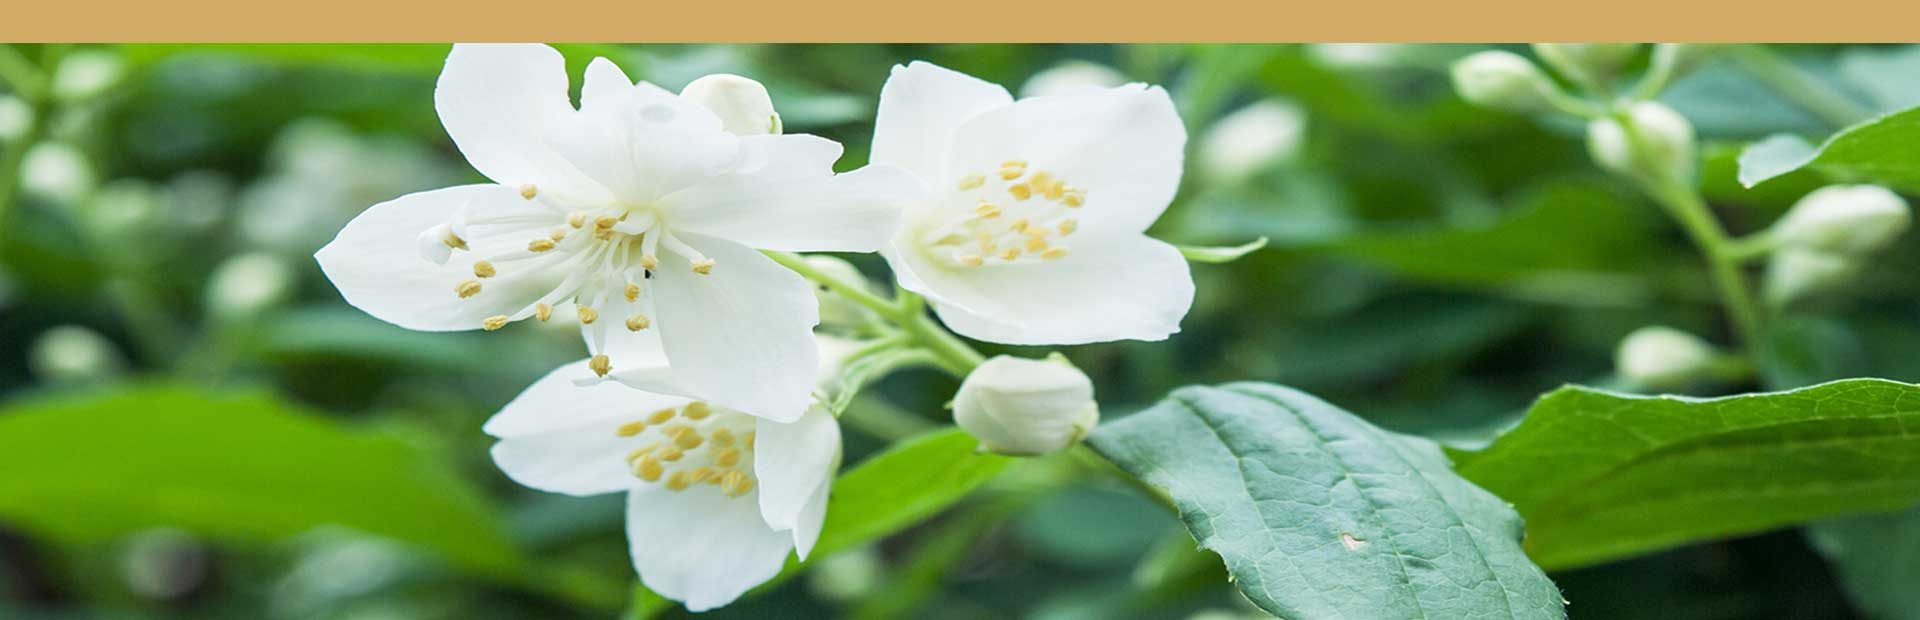 Jasmine-Perls-perfumadas-con-flor-de-jaz